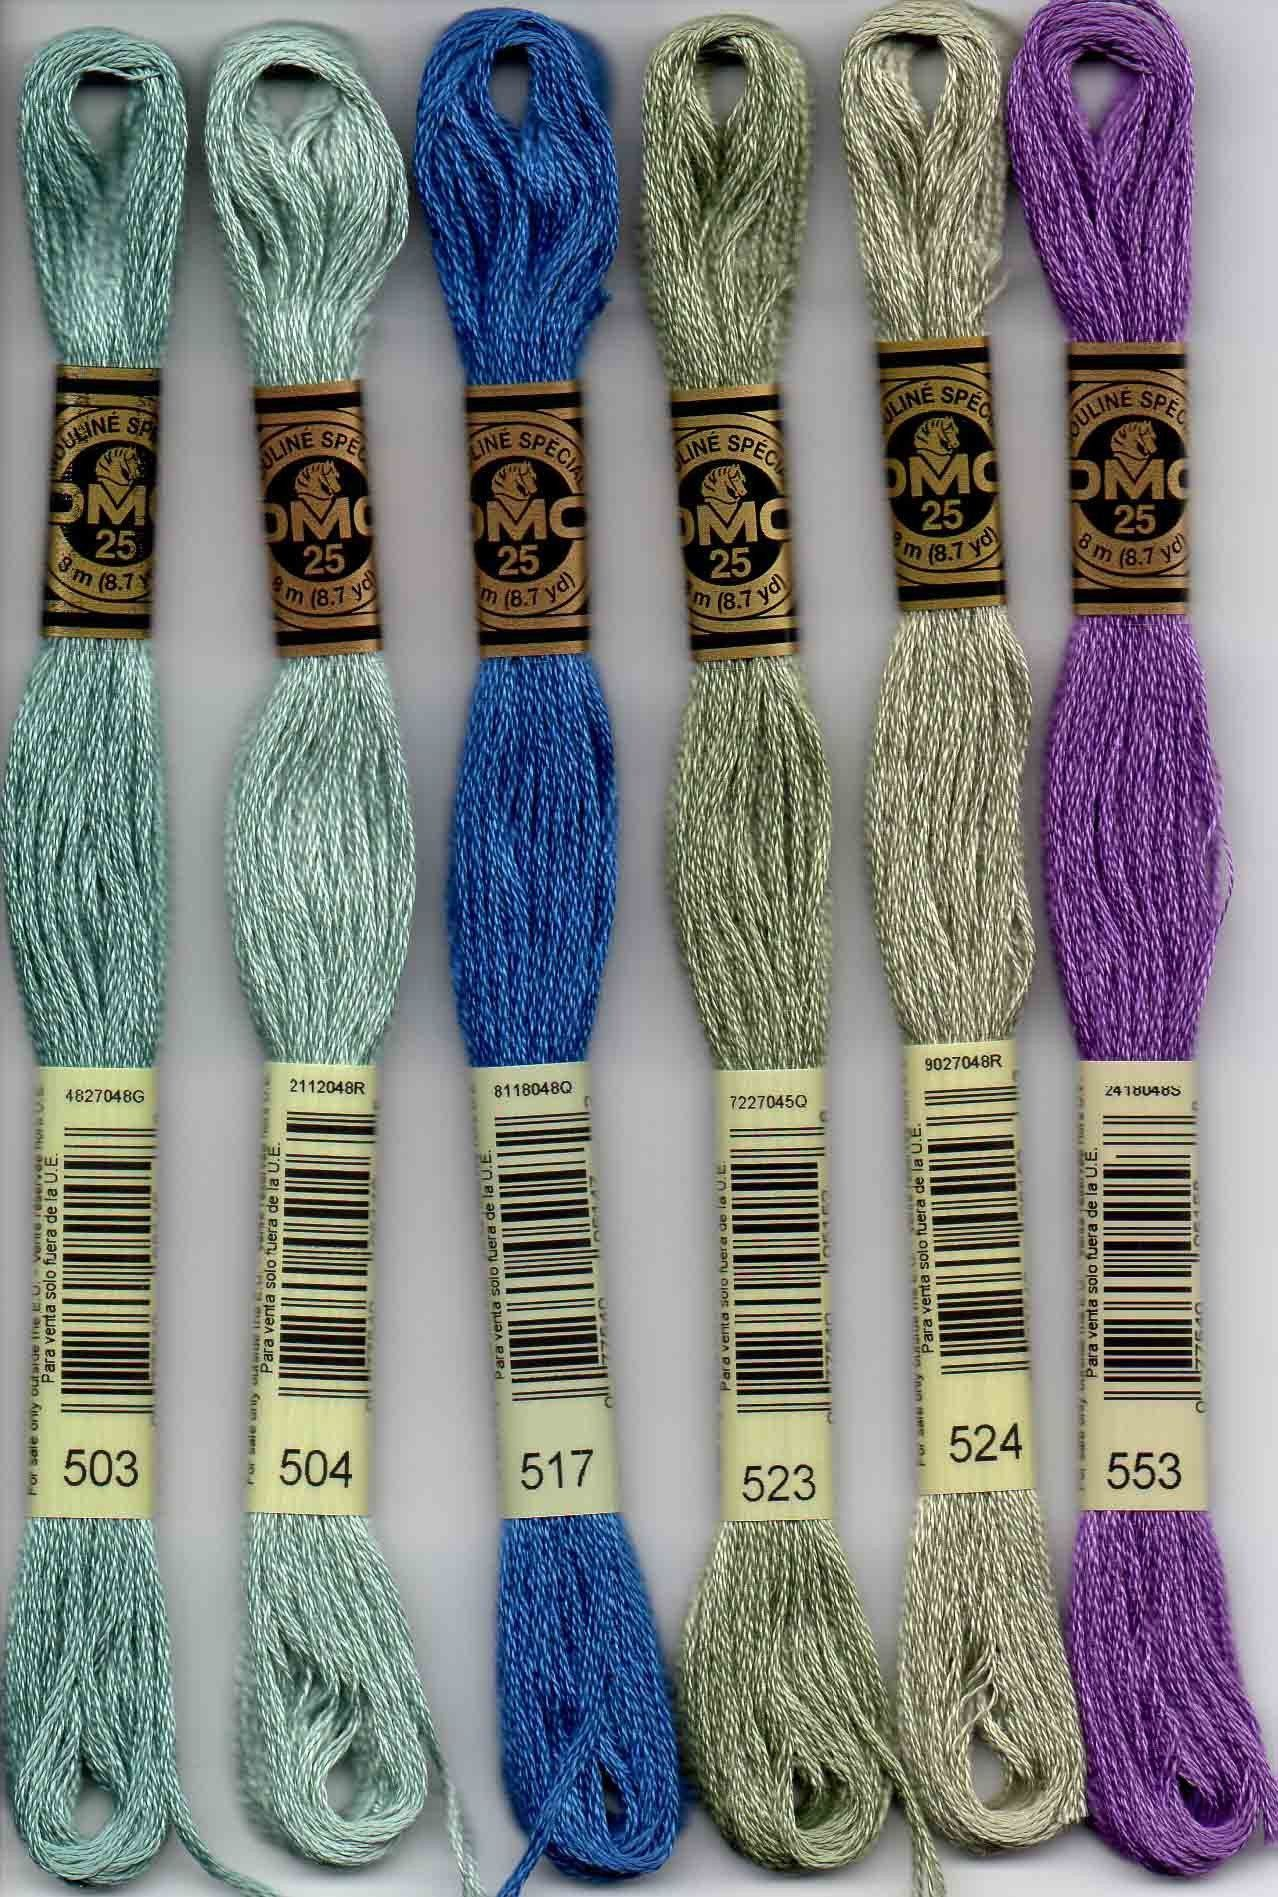 Sullivans Six Strand Embroidery Cotton 8.7 Yards-Very Dark Jade 12 per Box